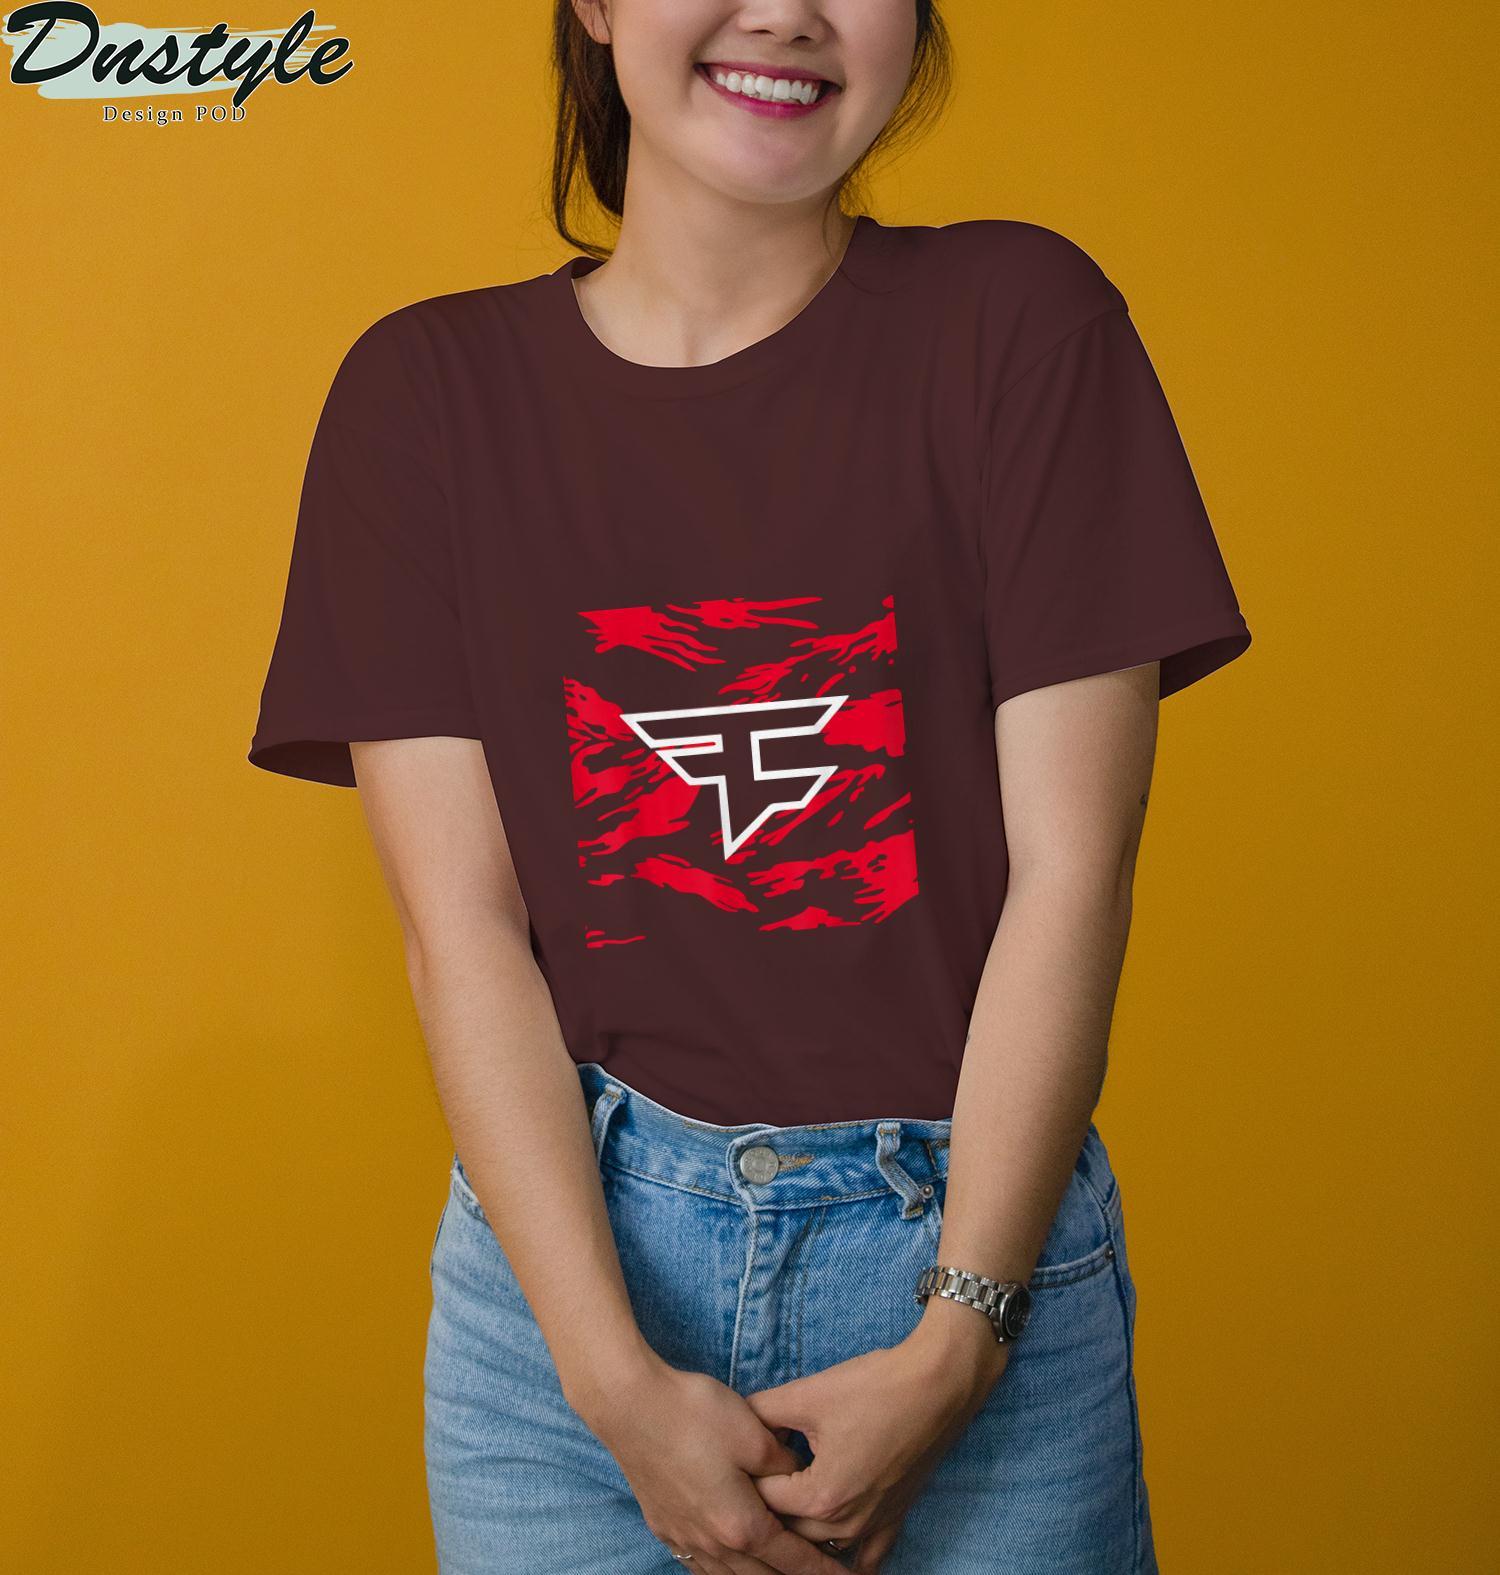 Graphic FaZe_Merch Clans Videogame Art Esports Entertainment T-Shirt 2